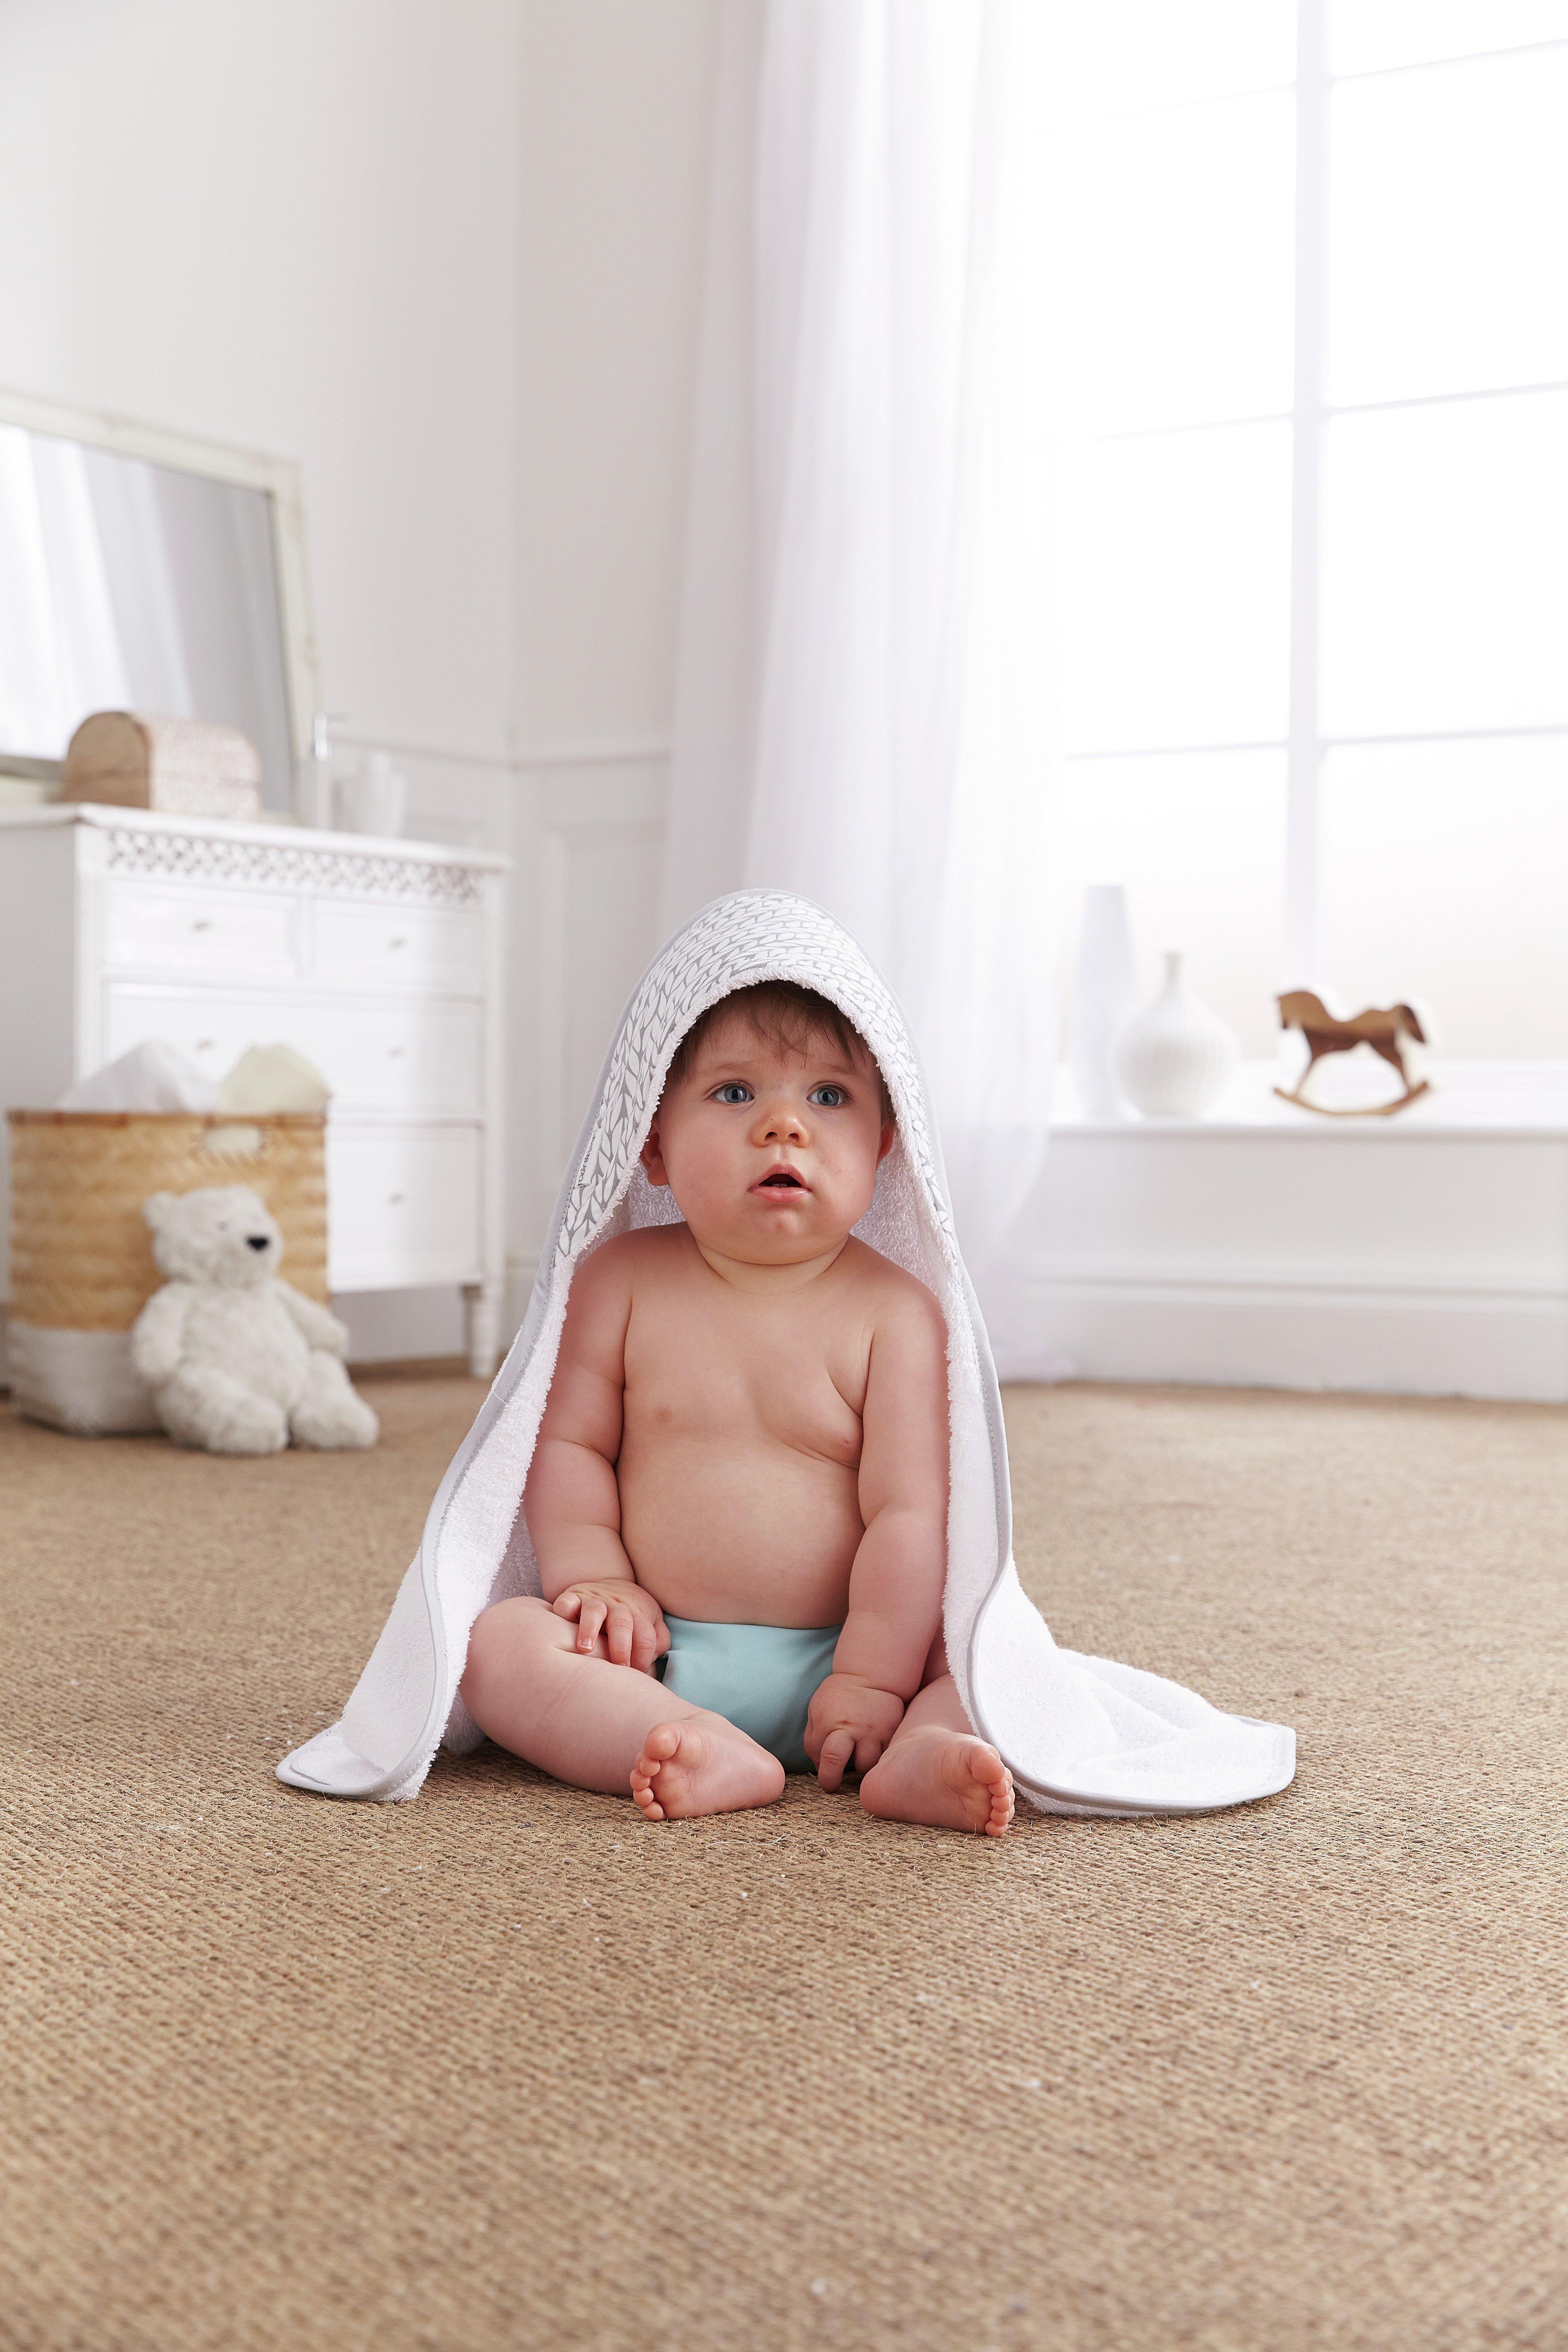 Image of Clair De Lune - Barley B?b? Hooded Baby Towel - Grey